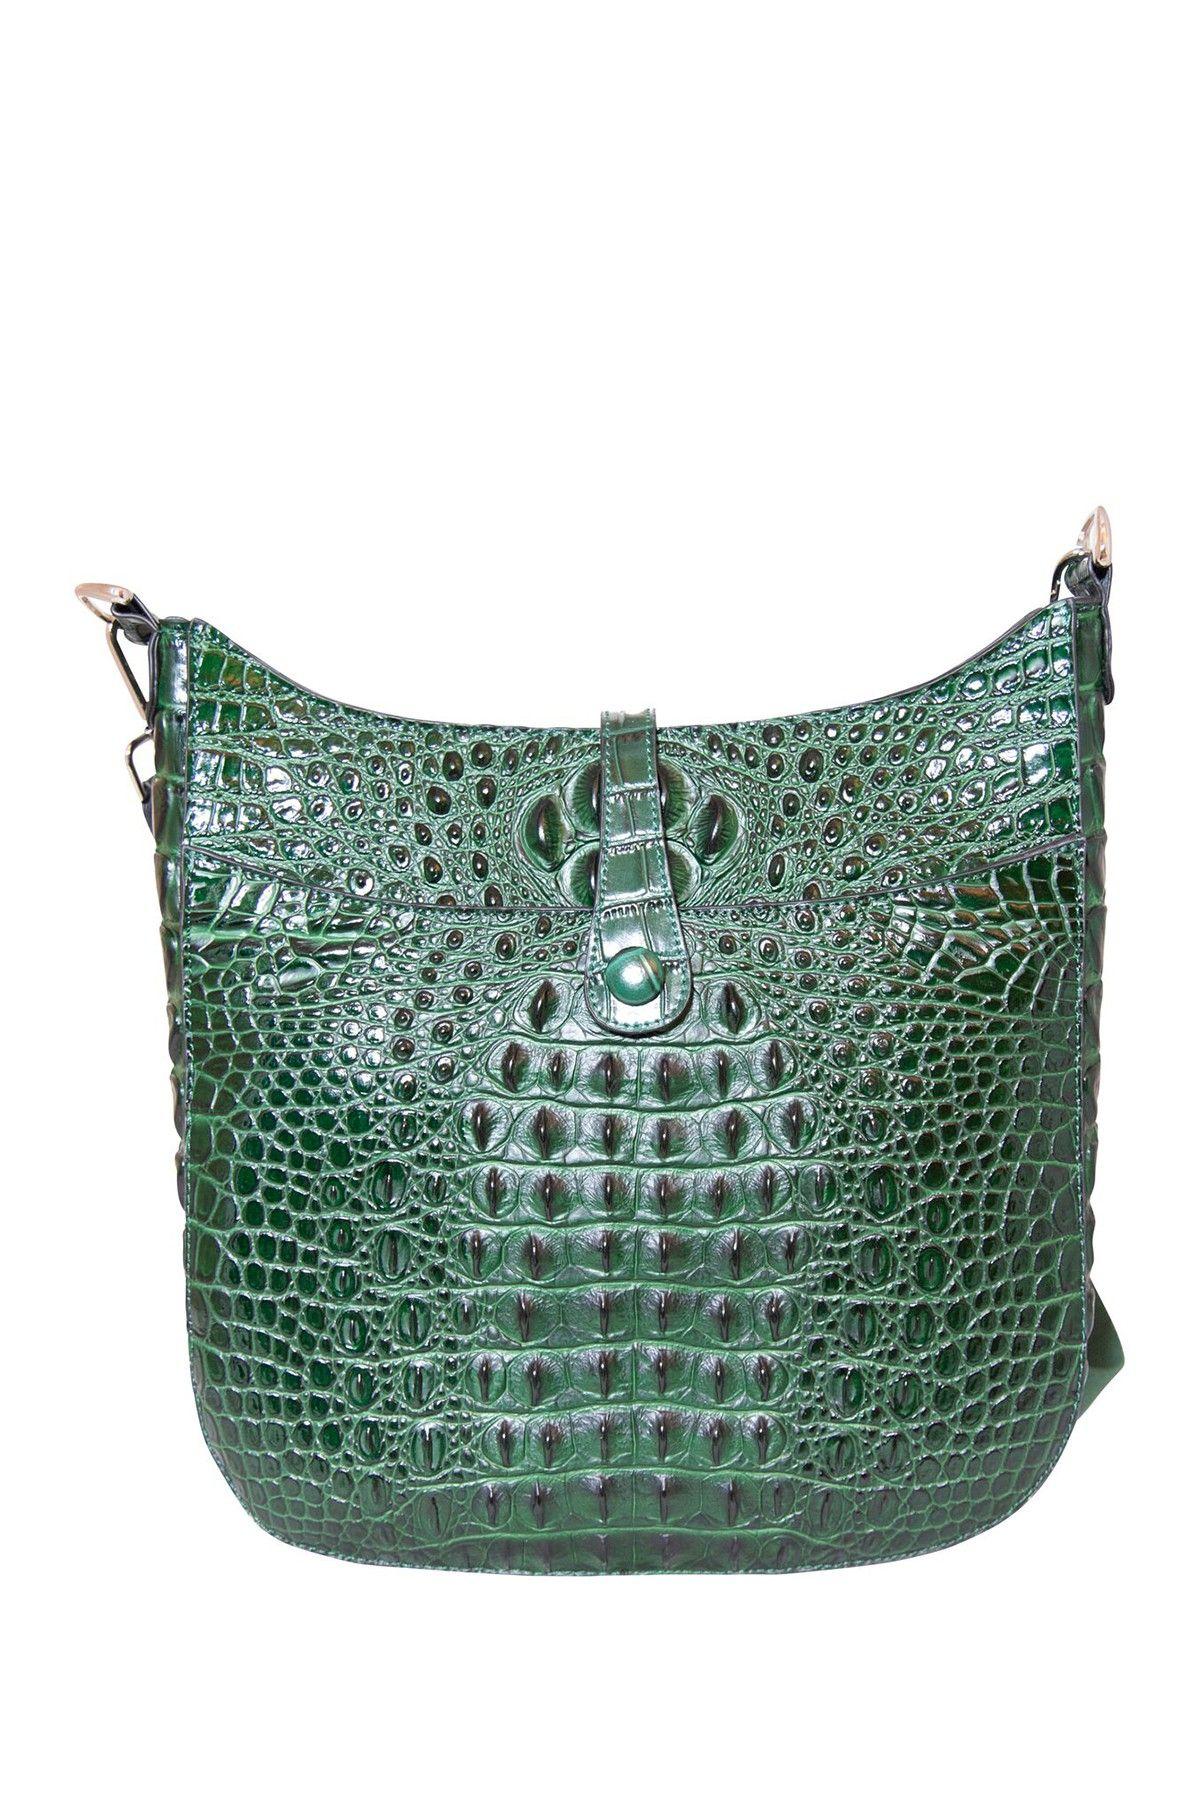 2c6c0632ed Tiffany and Fred Crocodile Embossed Leather Messenger Bag | fashion ...